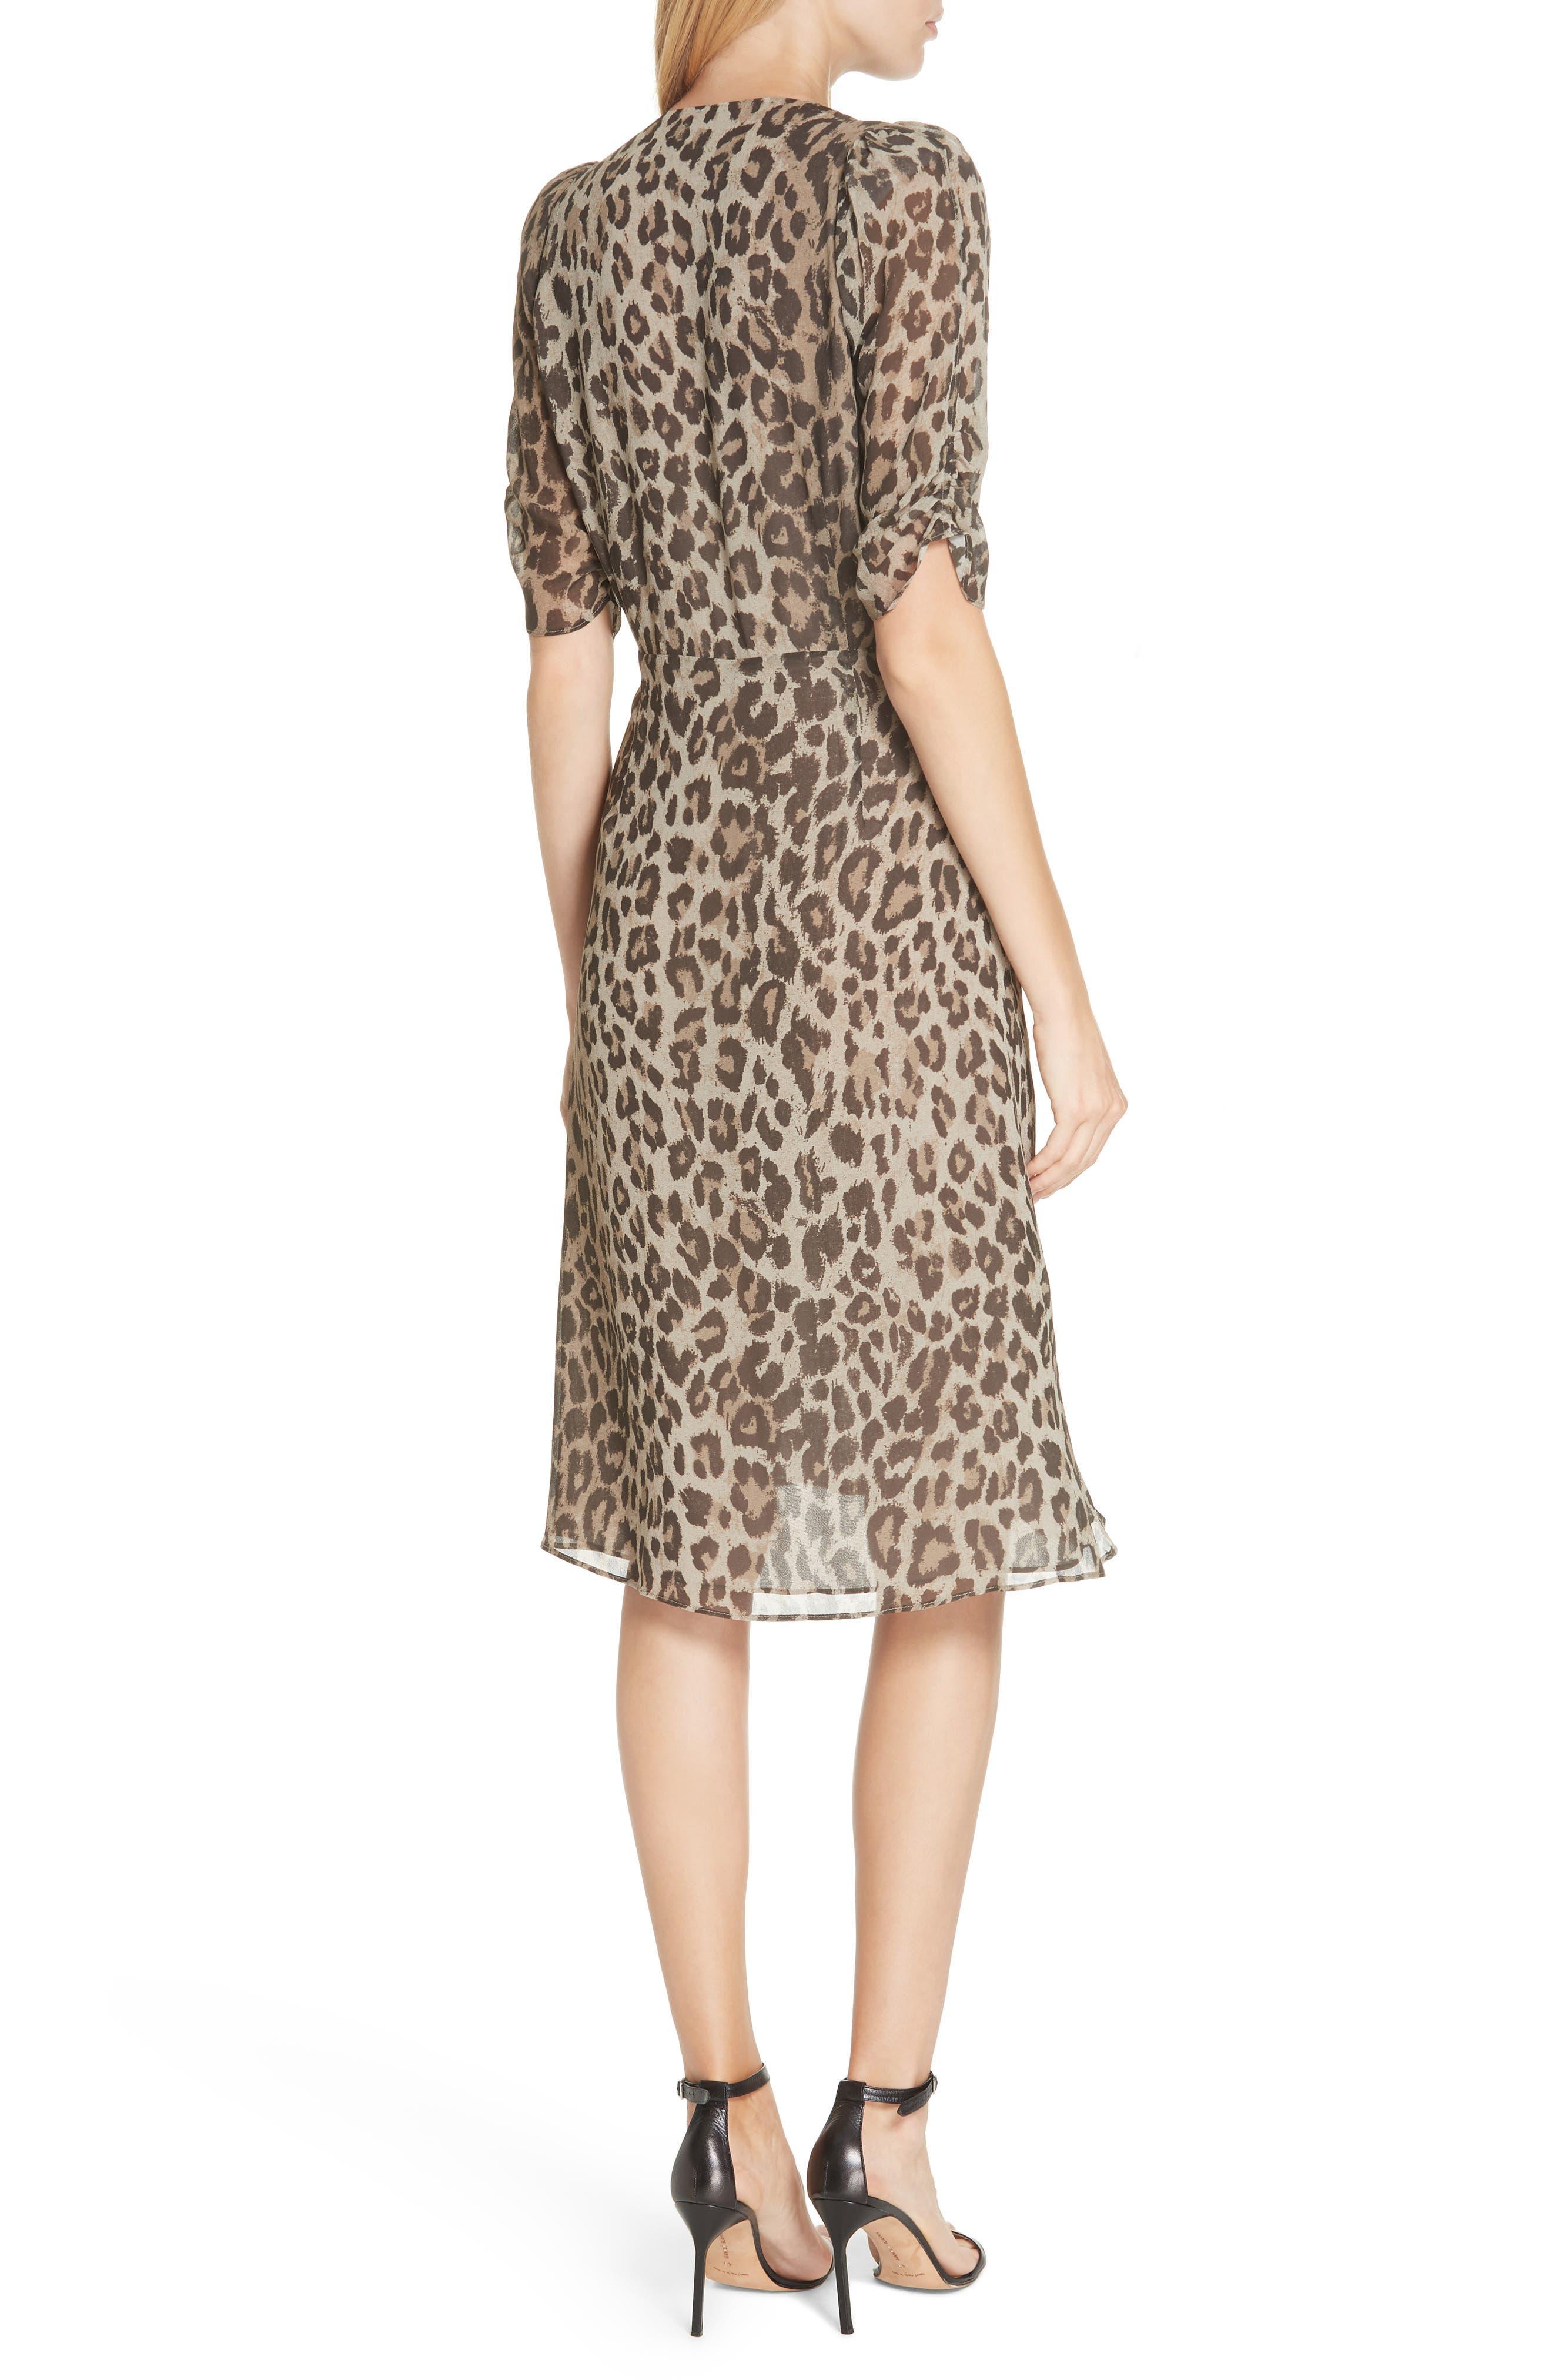 NICHOLAS, Ruched Leopard Print Silk Dress, Alternate thumbnail 2, color, 200